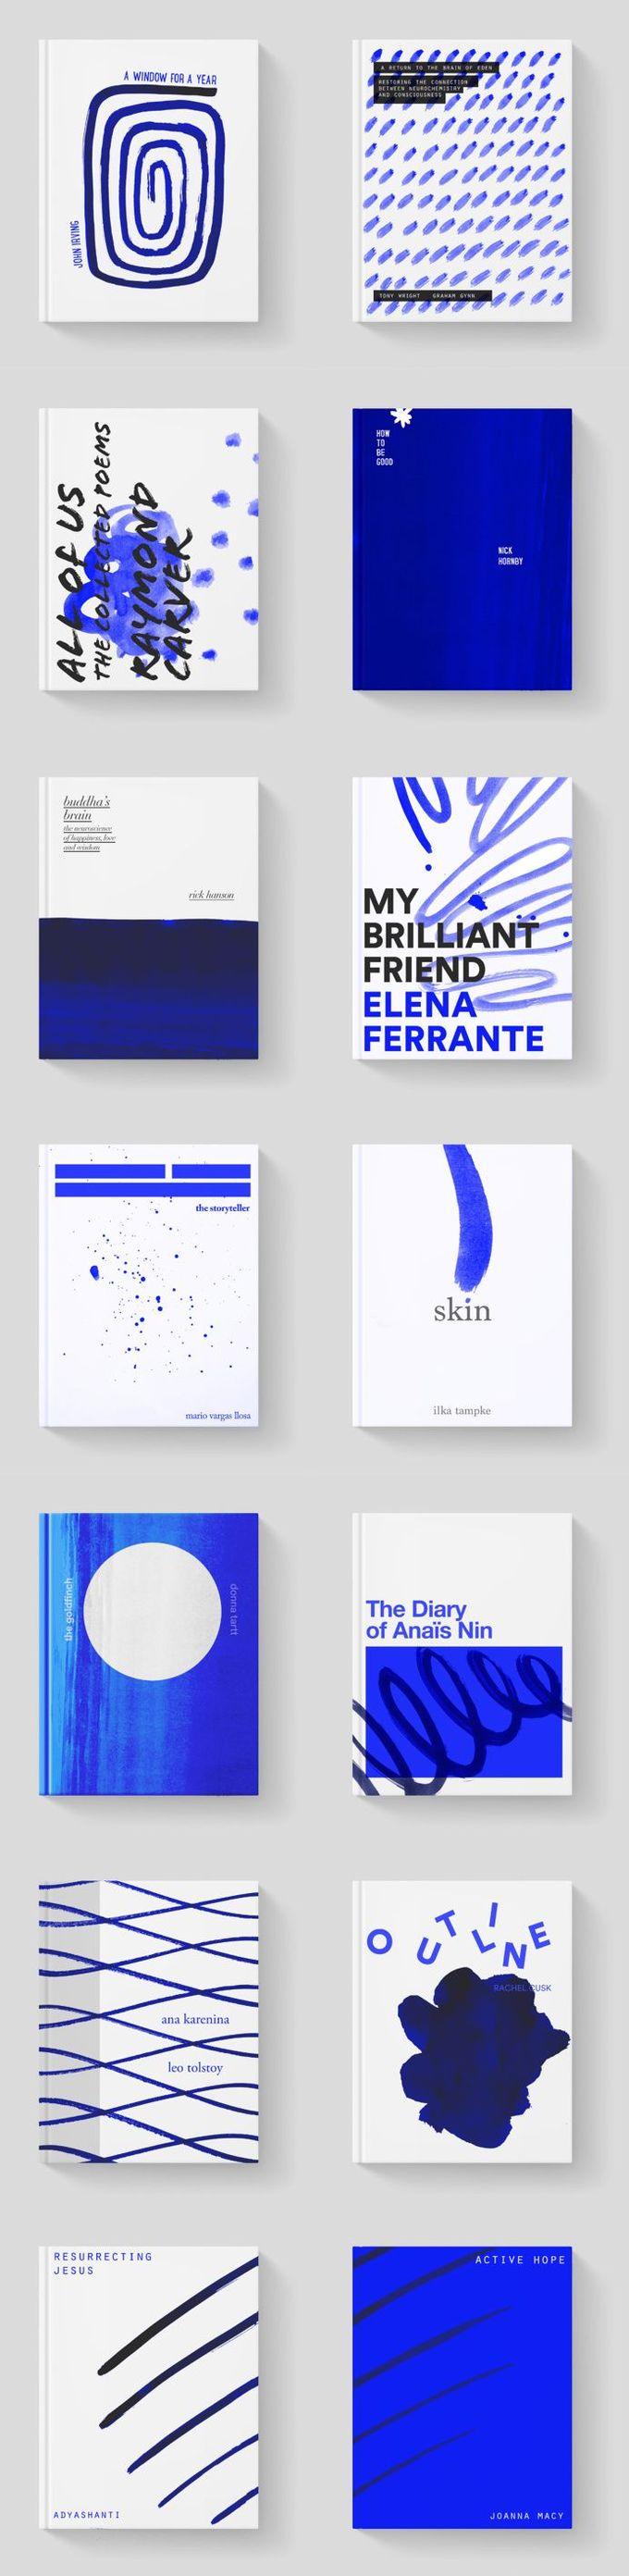 Everything — Designspiration                                                                                                                                                                                 More